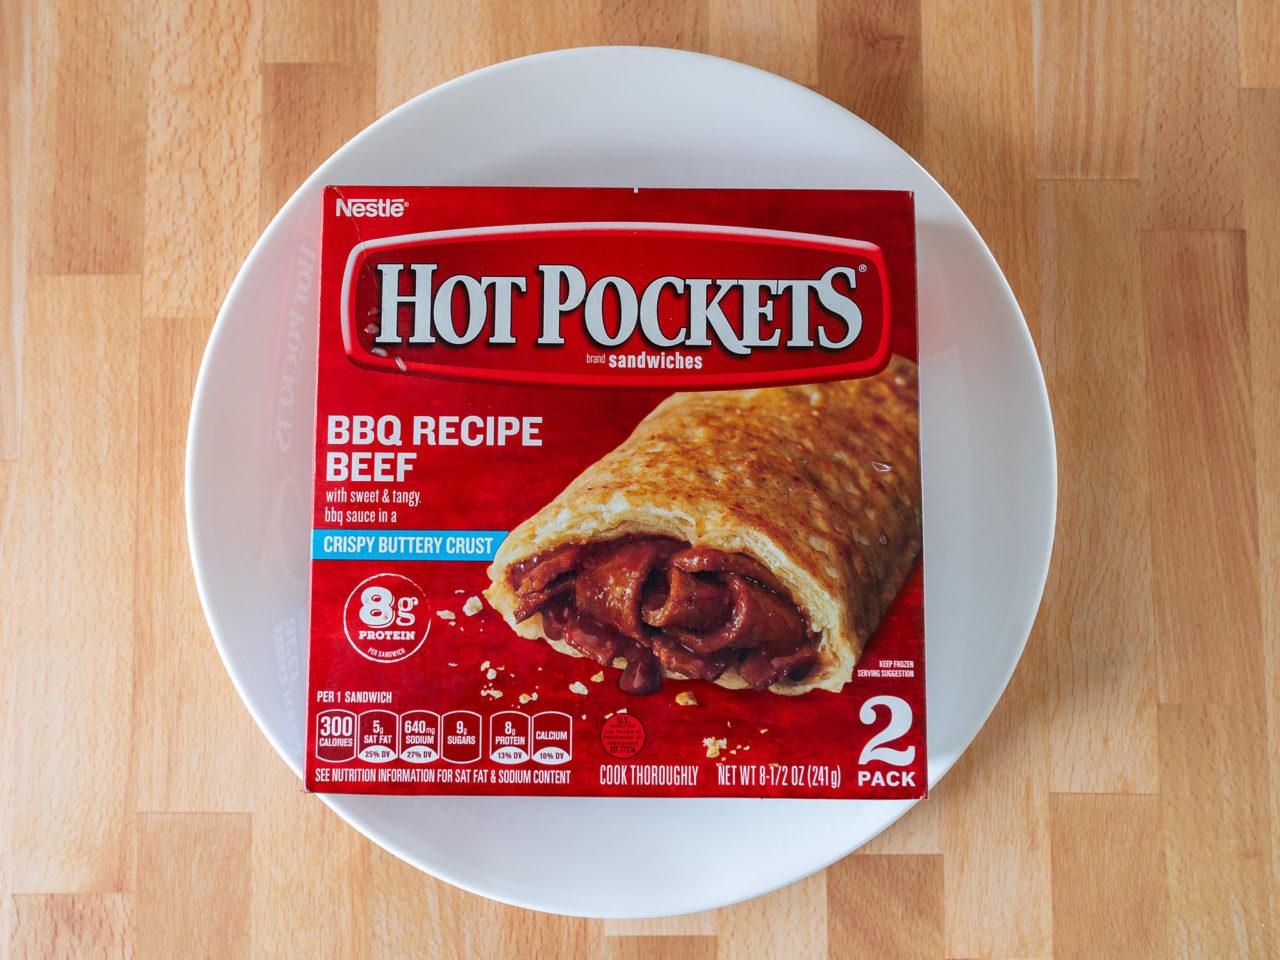 BBQ recipe Beef Hot Pockets